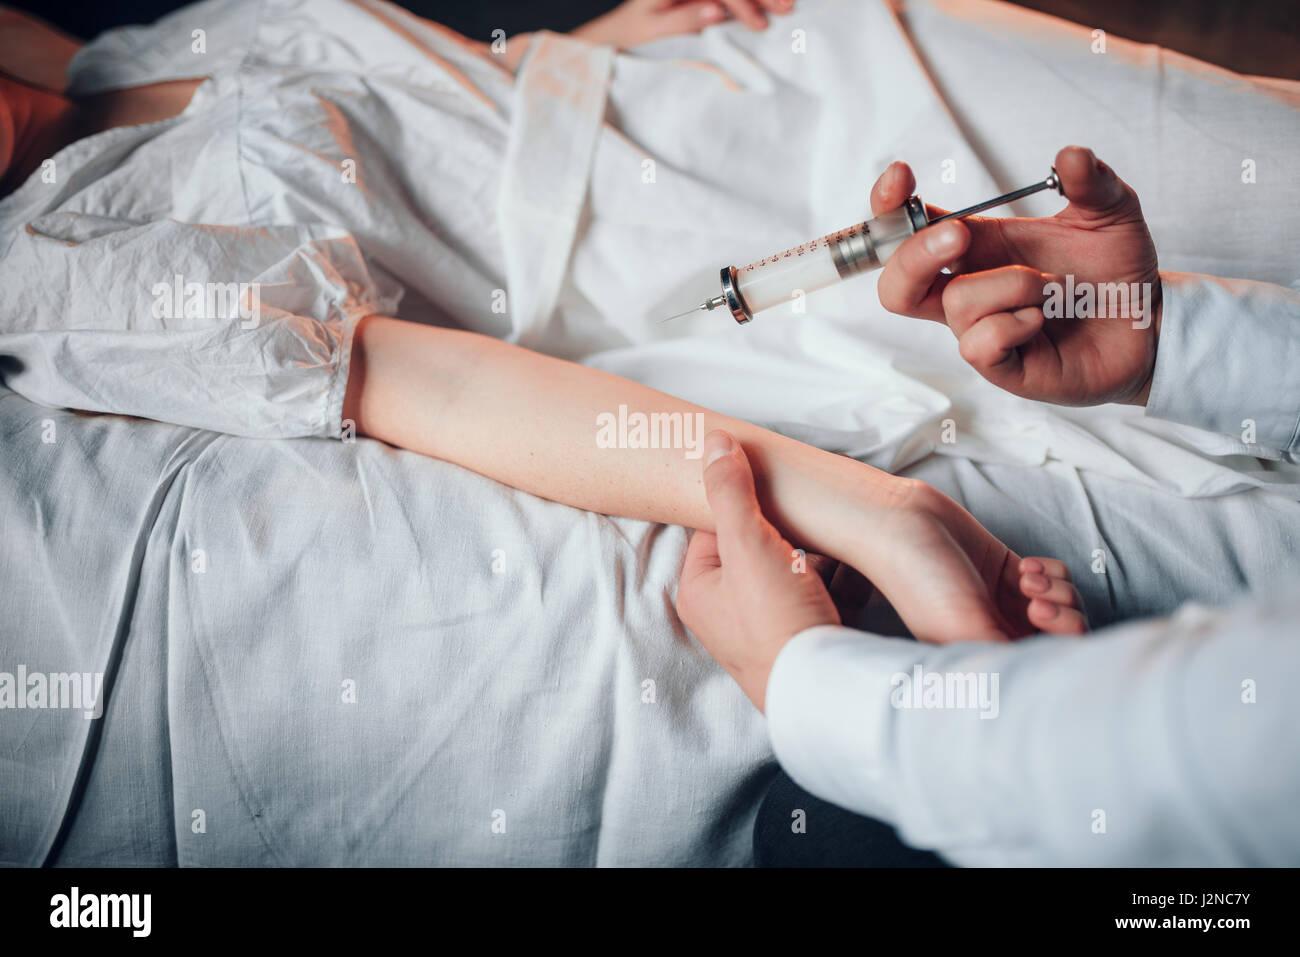 Medecin Homme Rend L Injection Seringue De Femme Malade Dans Lit D